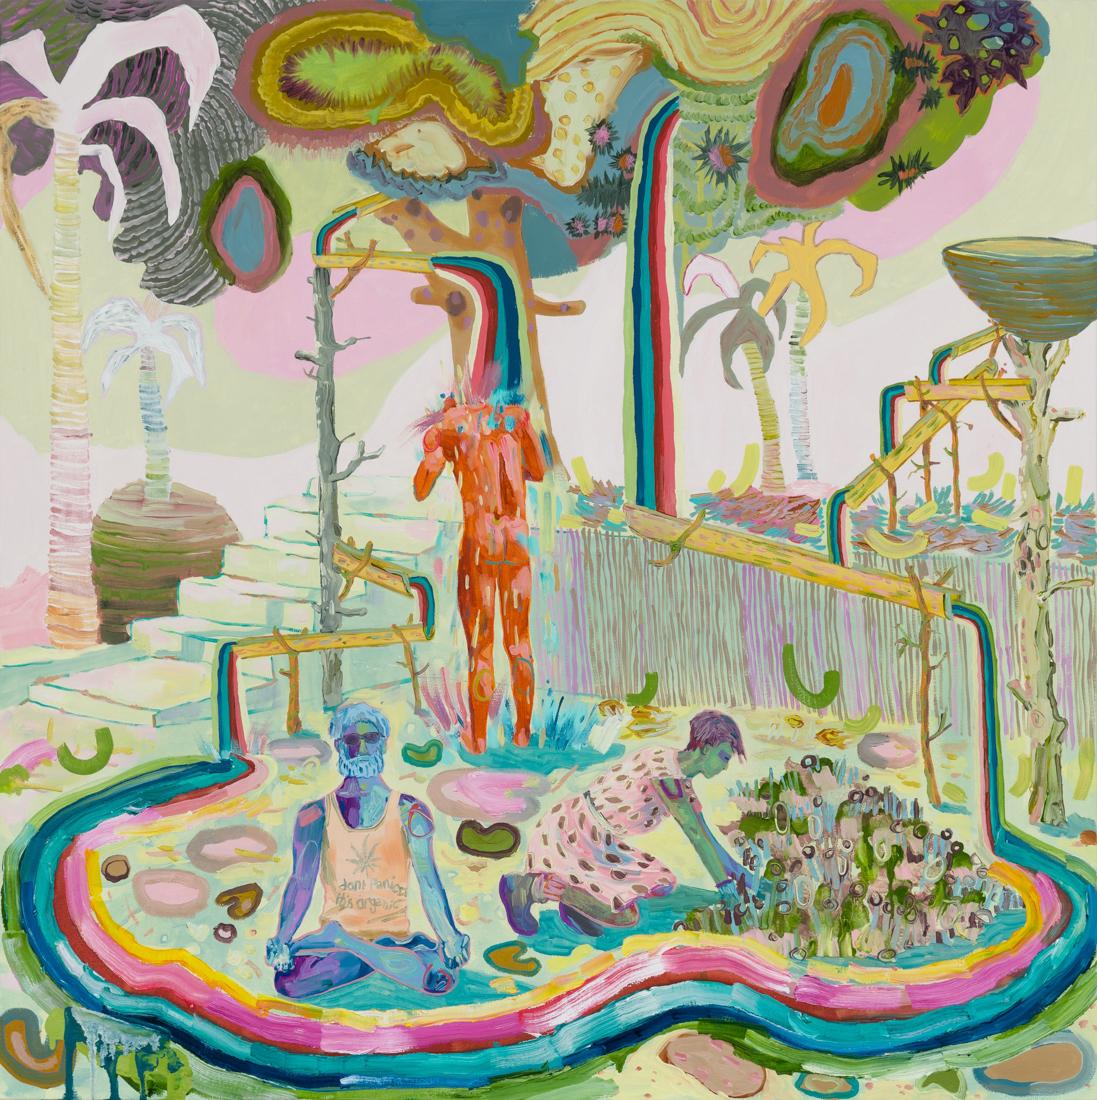 Melanie Daniel  Rainbow Colony , 2018 Oil on canvas 35 x 35 in